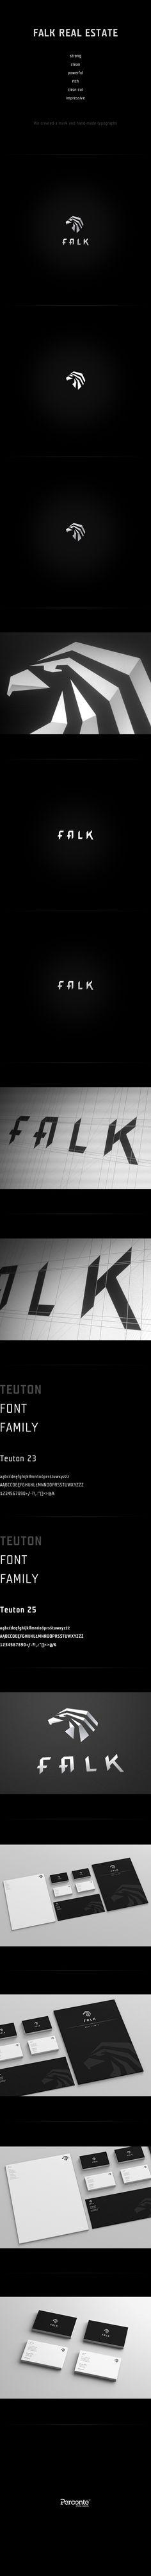 FALK Real Estate - Visual Identity by Perconte , via Behance